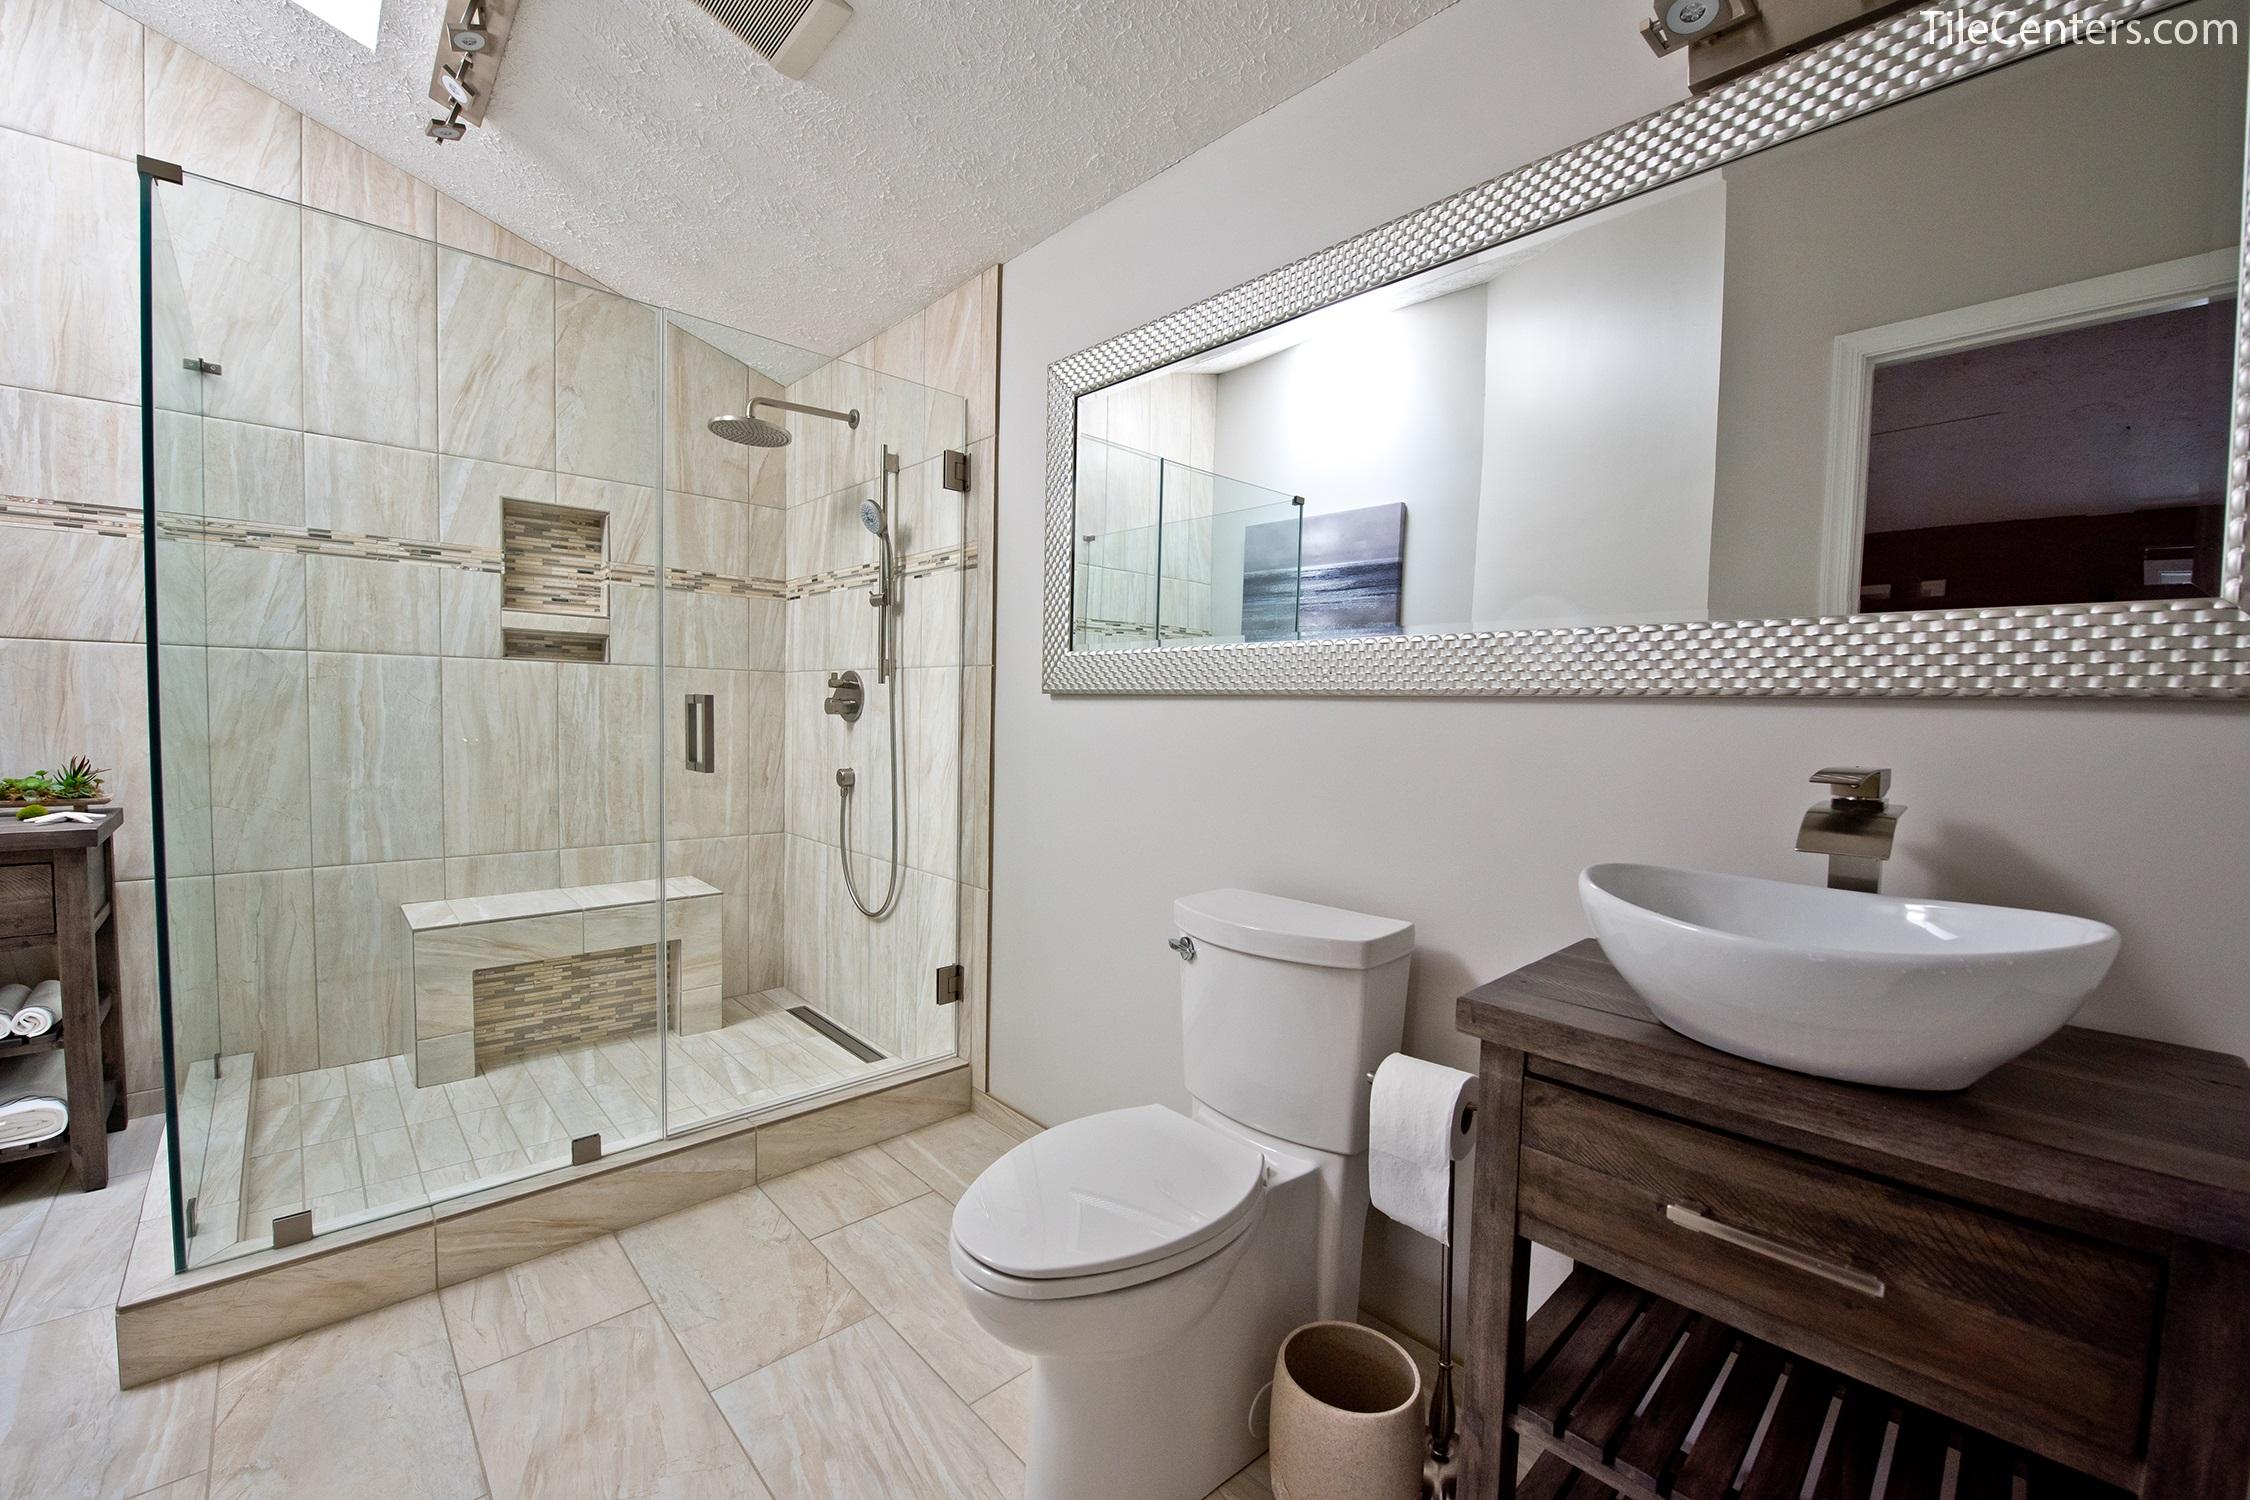 Bathroom Remodel Whitestone Rd Silver Spring Md 20901